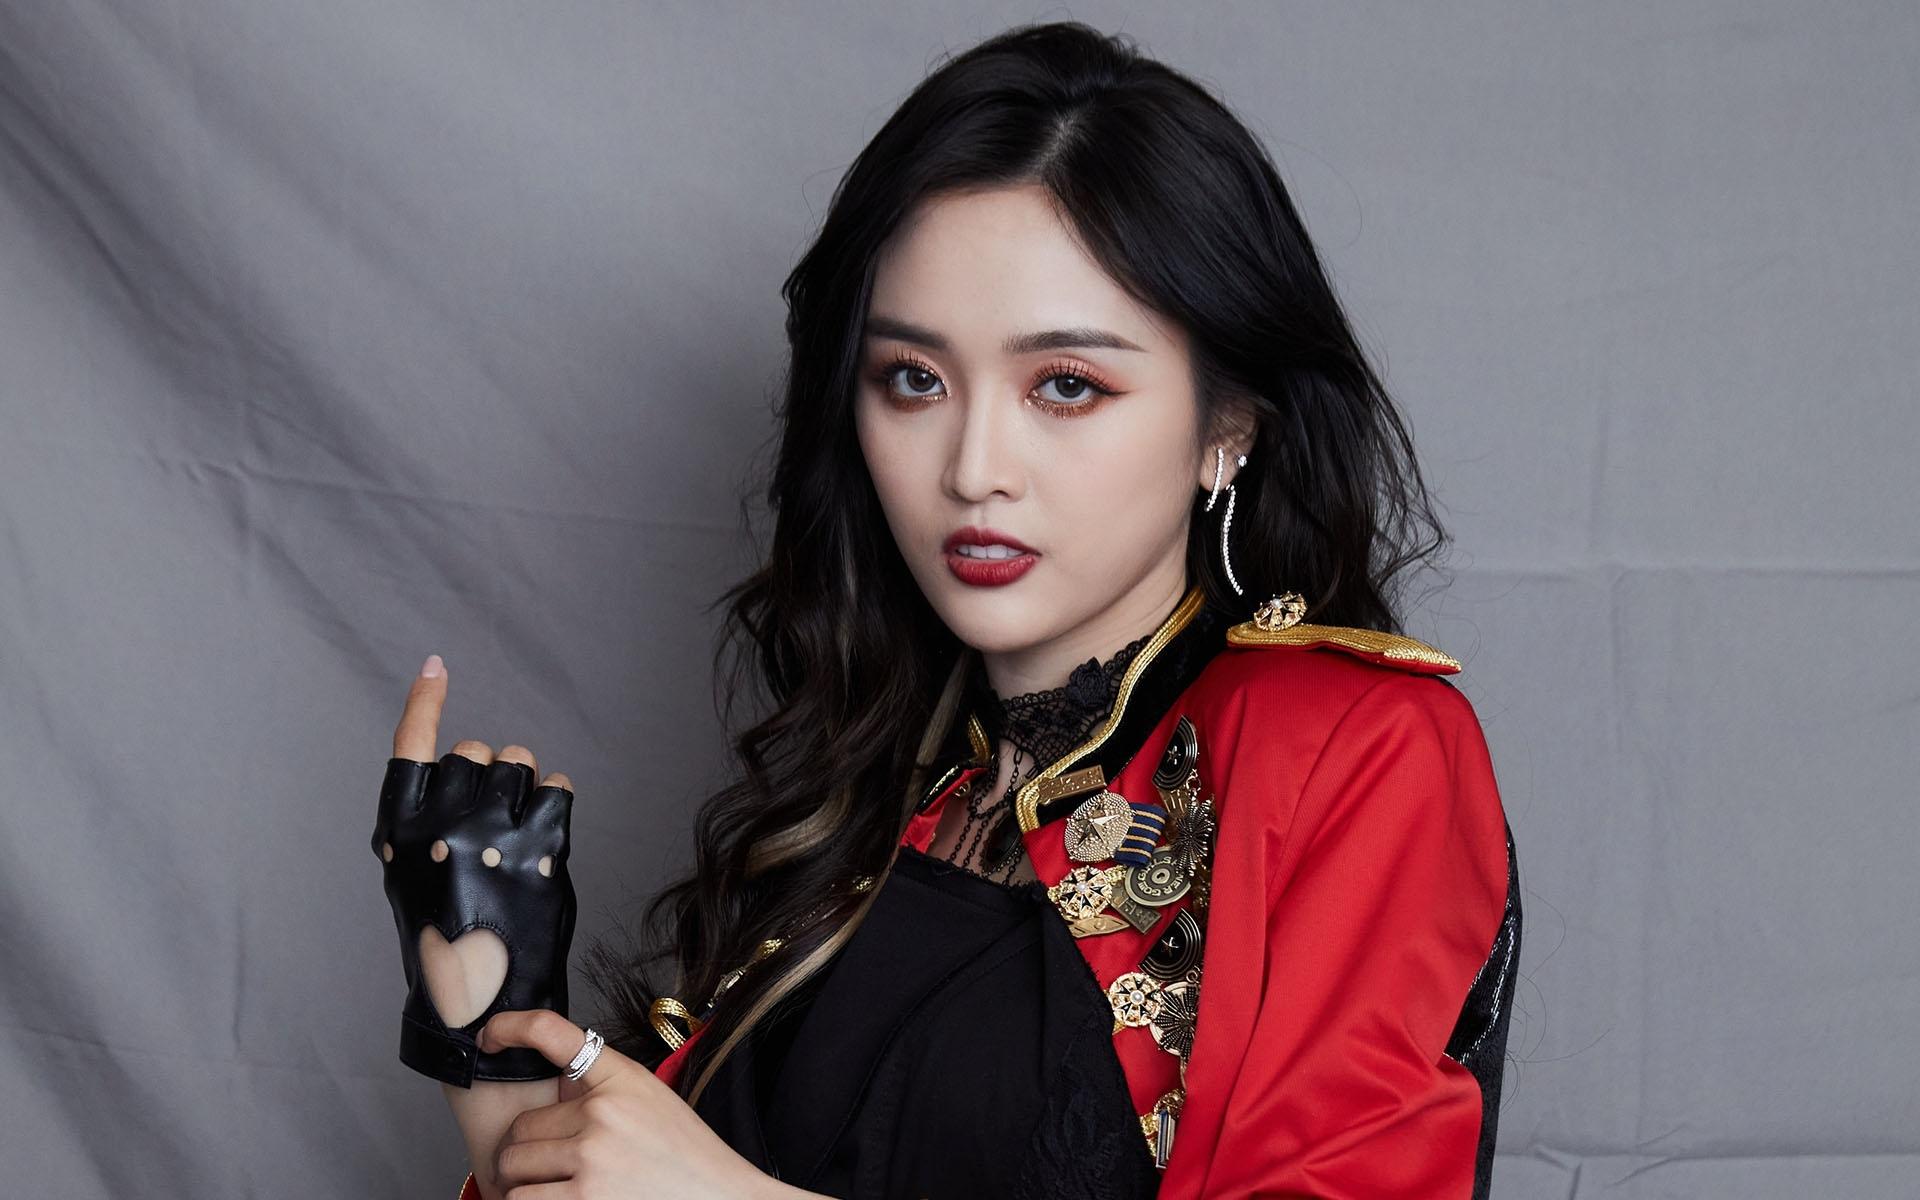 sexinsex 明星合成图  吴宣仪